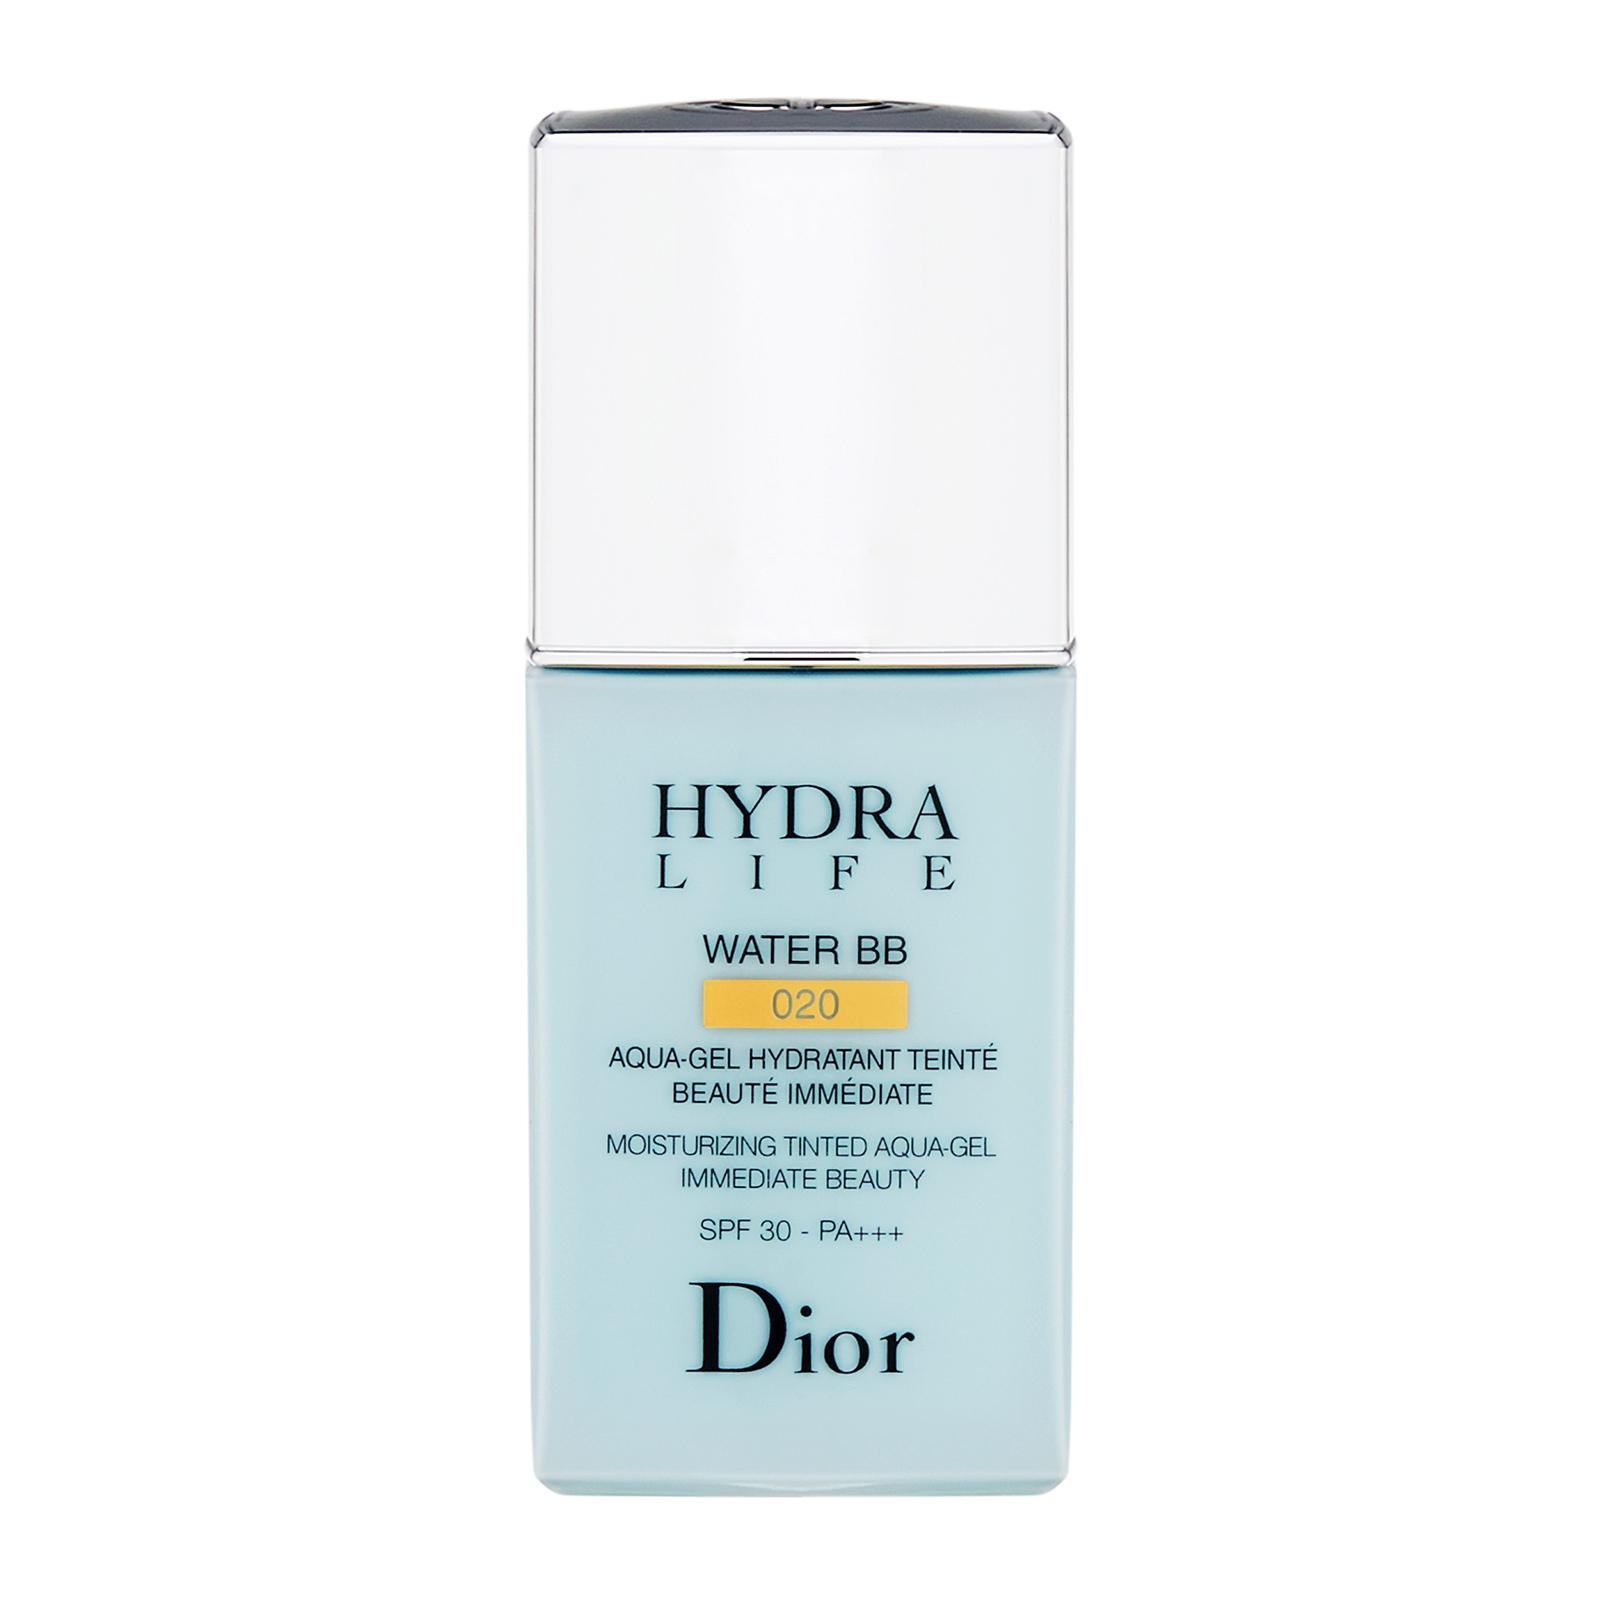 Christian Dior Hydra Life Moisturizing Tinted Aqua-Gel Immediate Beauty Water BB SPF30 / PA+++ 020, 1oz, 30ml